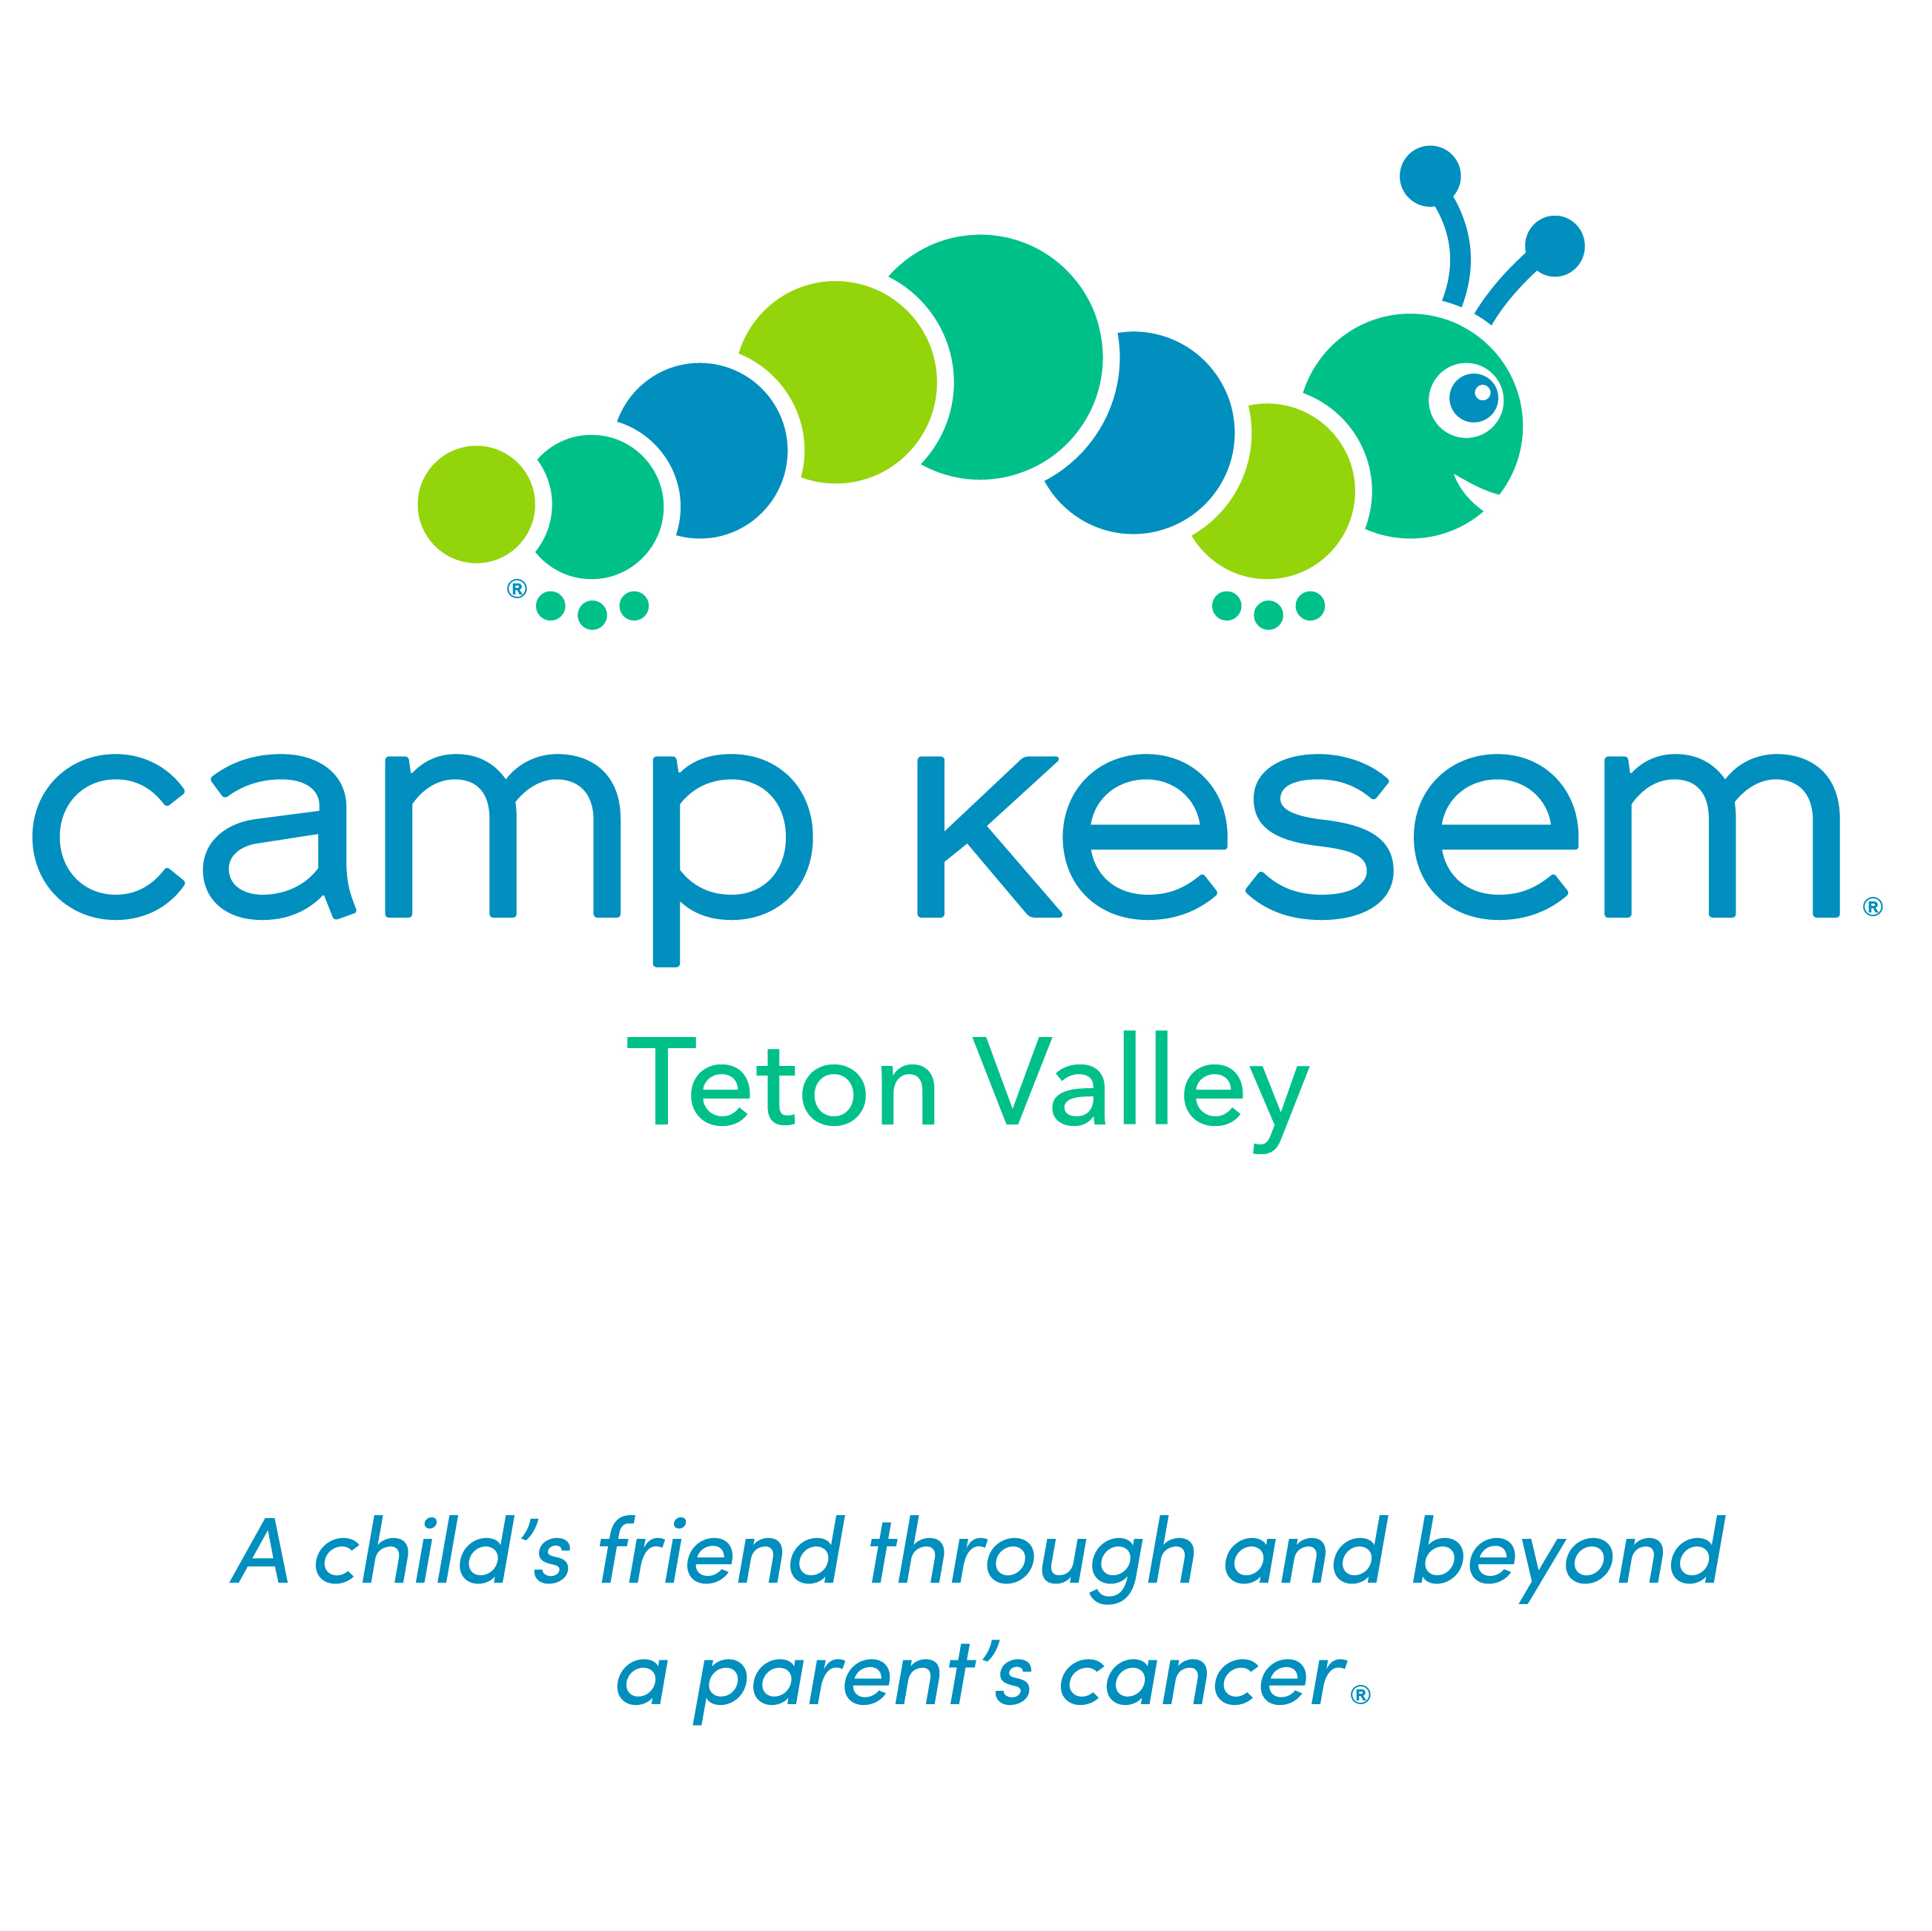 Camp Kesem Teton Valley